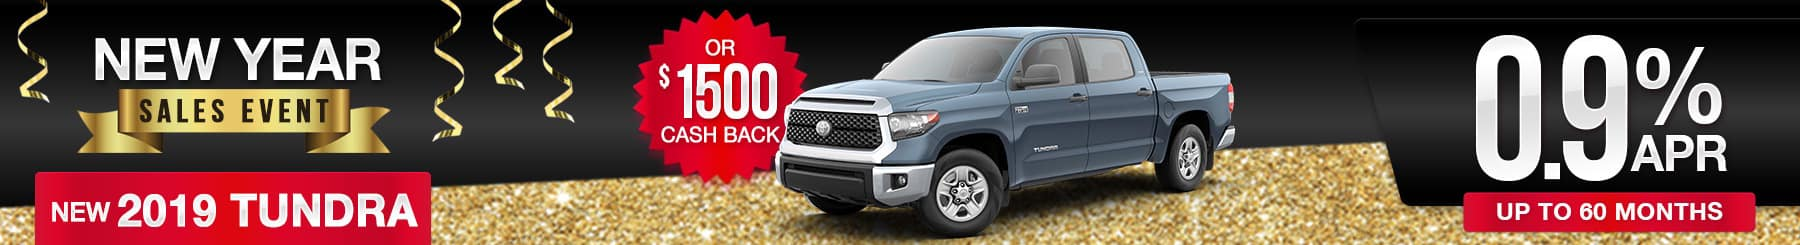 2019 Tundra Sales Deal